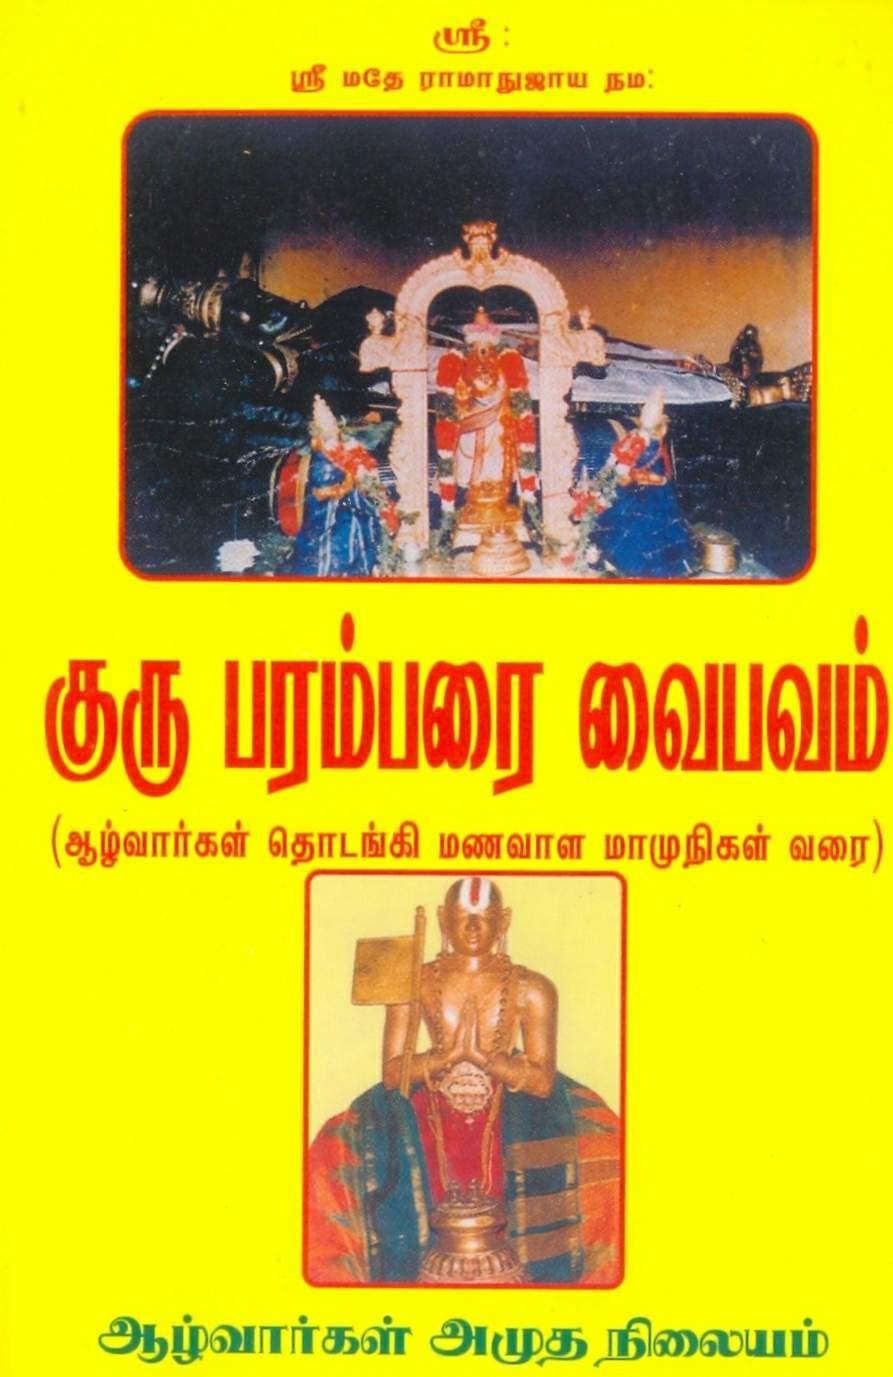 Printed book -Thenkalai sri Vaishnava Guruparampara(i) GPP தென்கலை குருபரம்பரை எளிய நடை ஆழ்வார்கள் அமுத நிலையம்